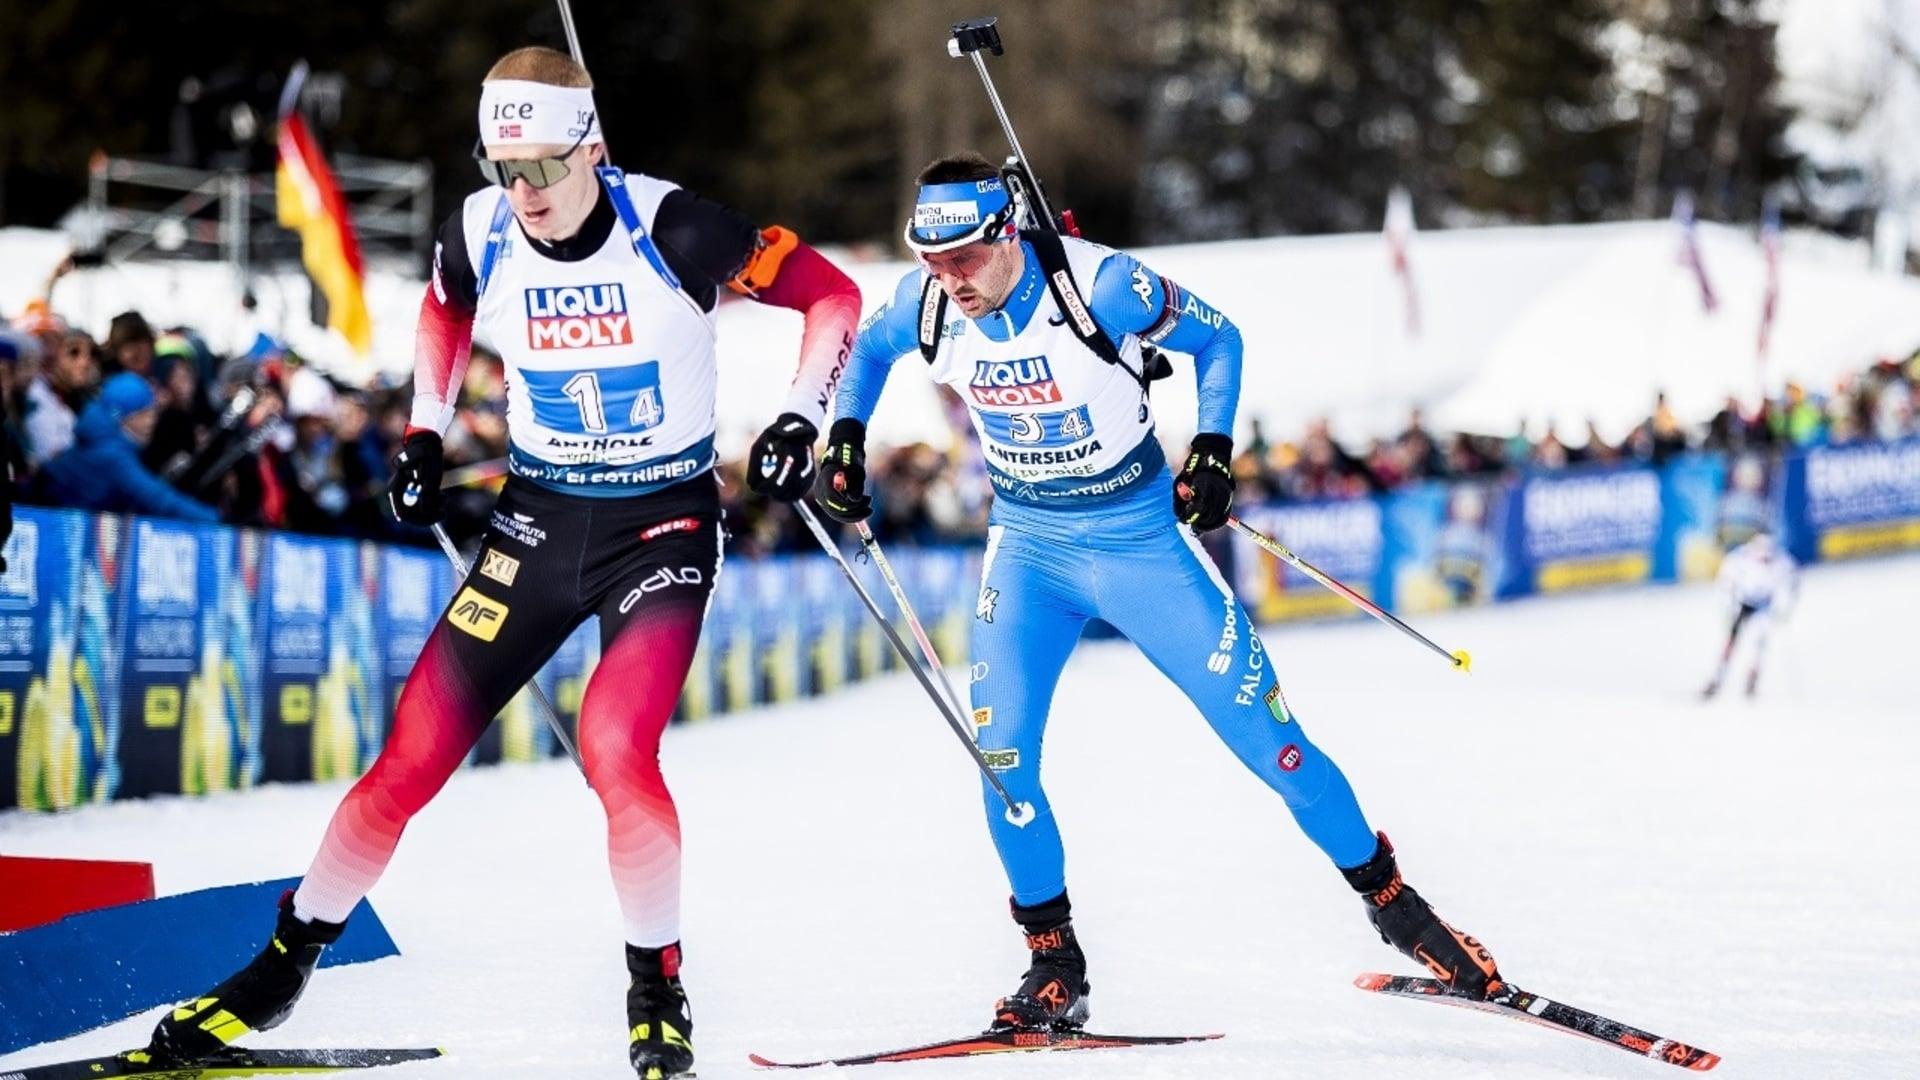 14.02.2020 - Männer-Sprint verspricht Spannung pur